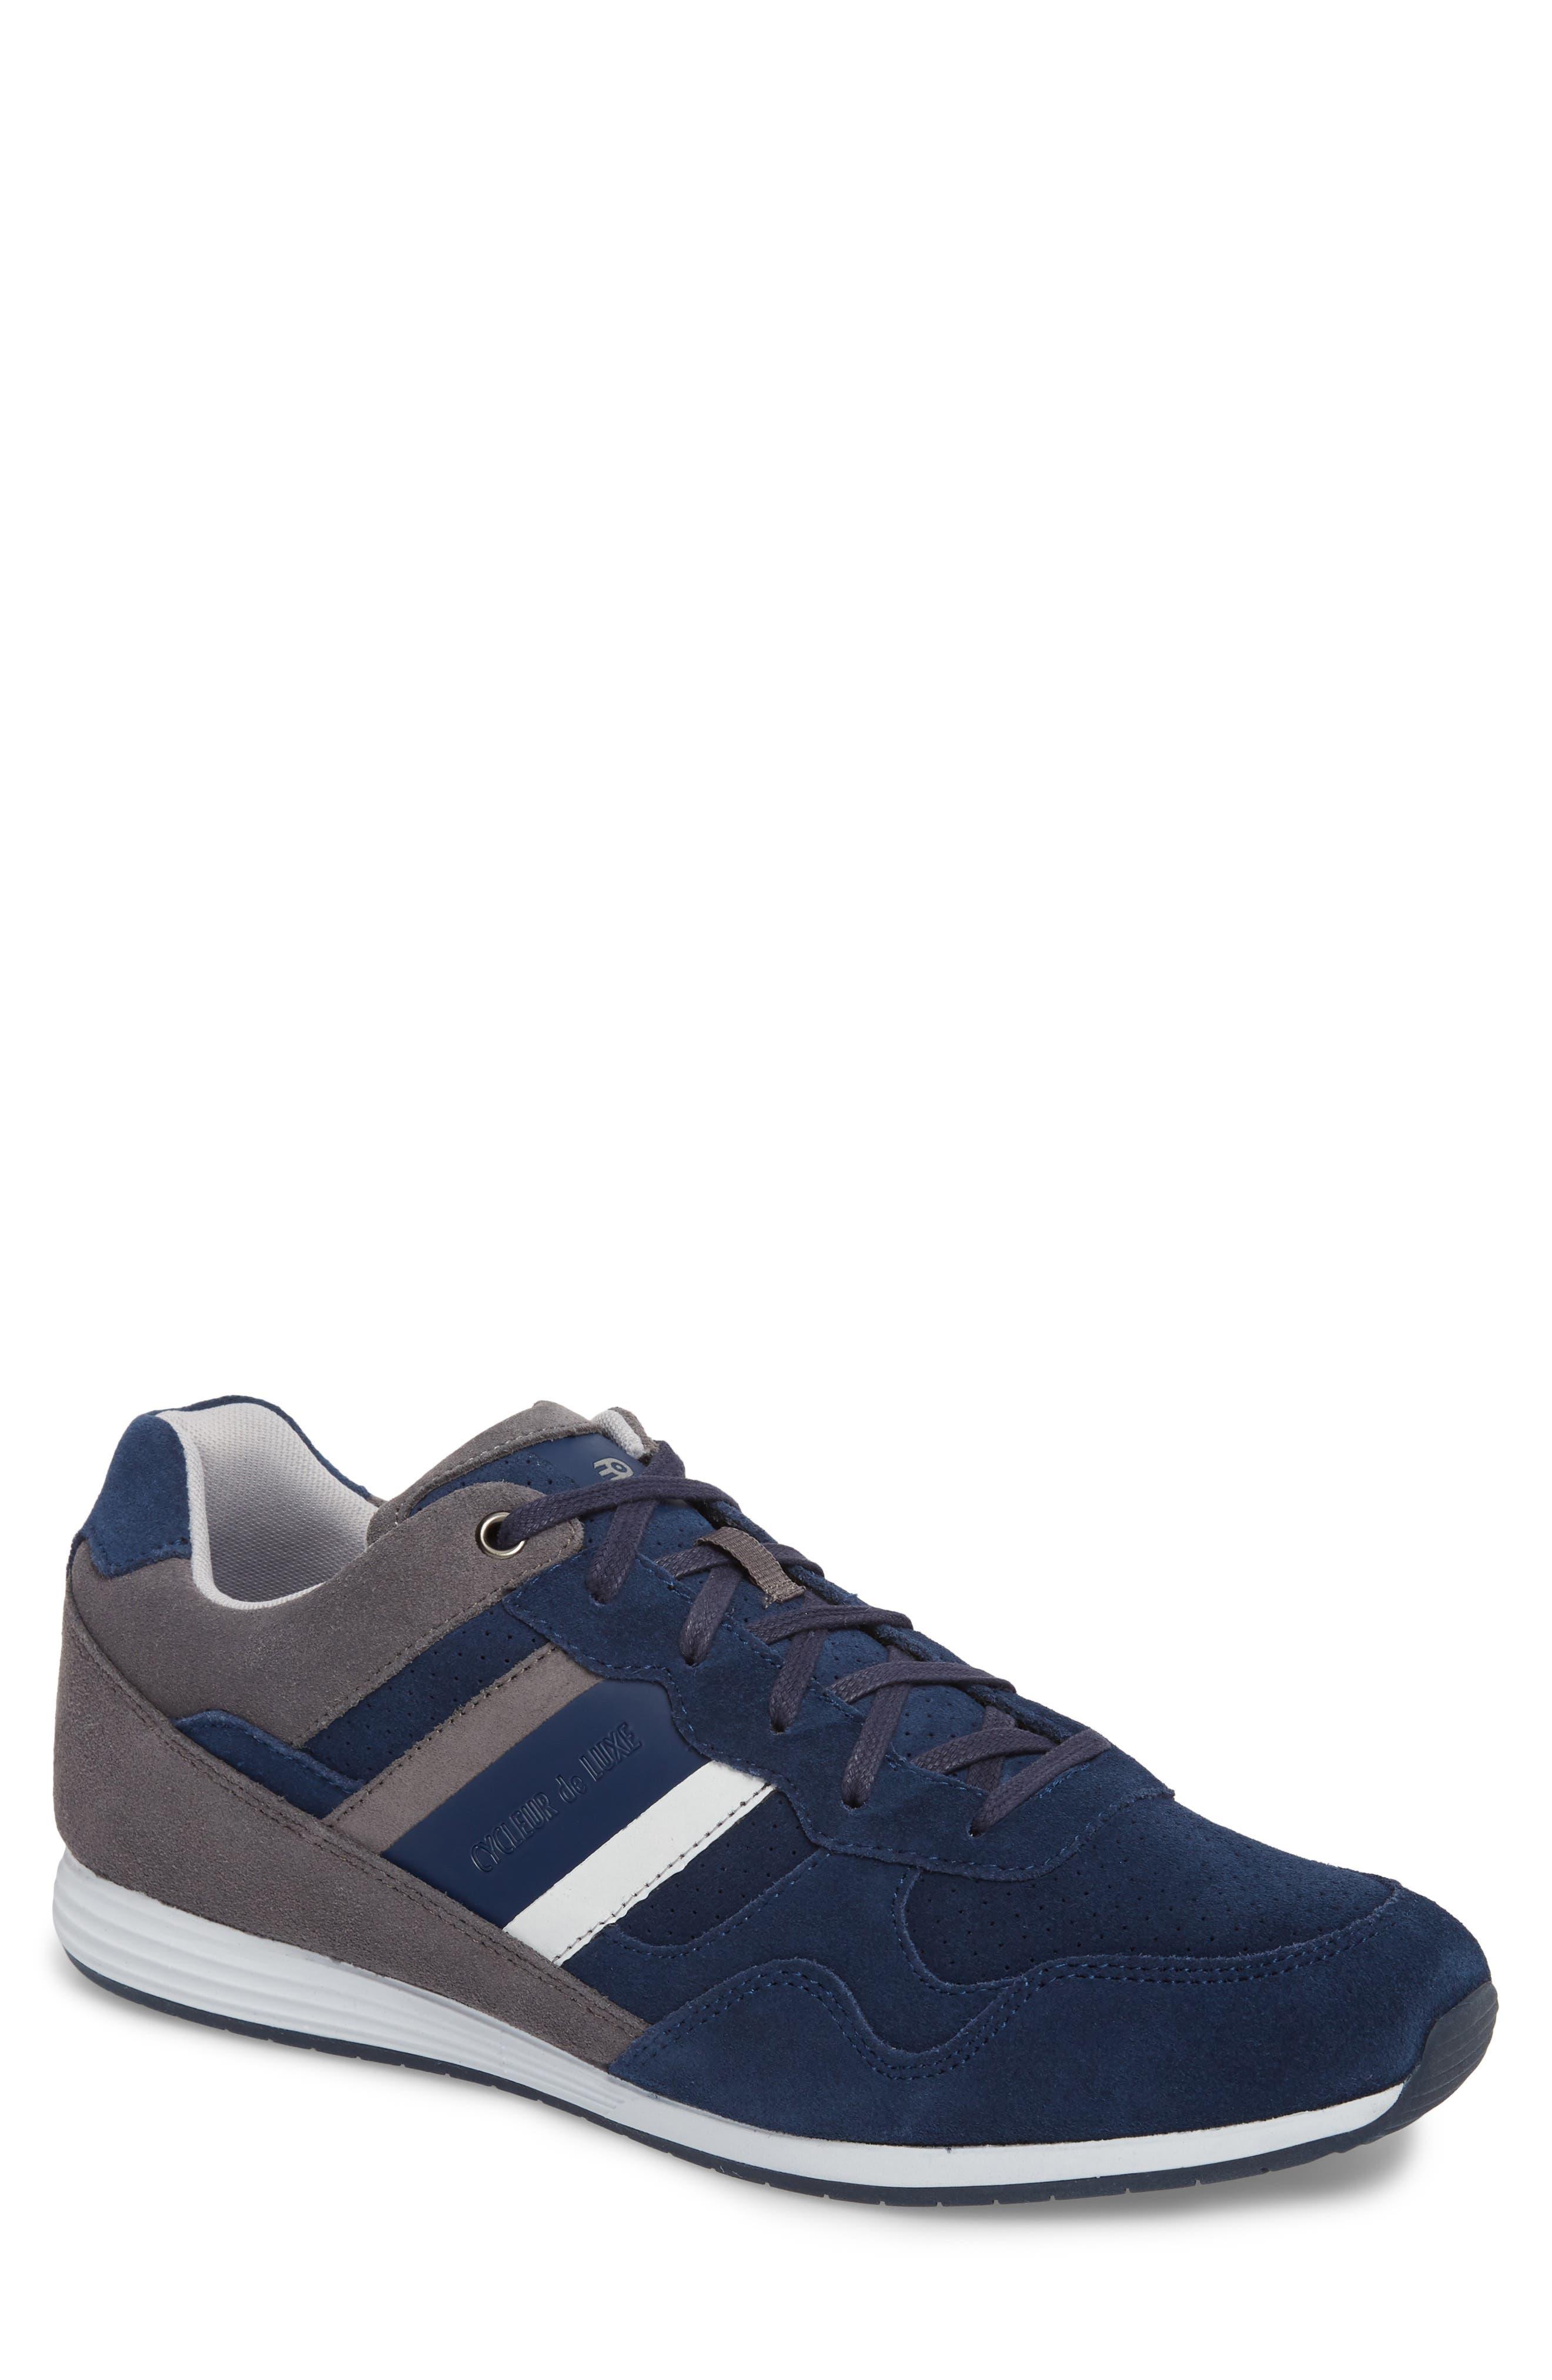 Scarpo Low Top Sneaker,                             Main thumbnail 1, color,                             NAVY SUEDE